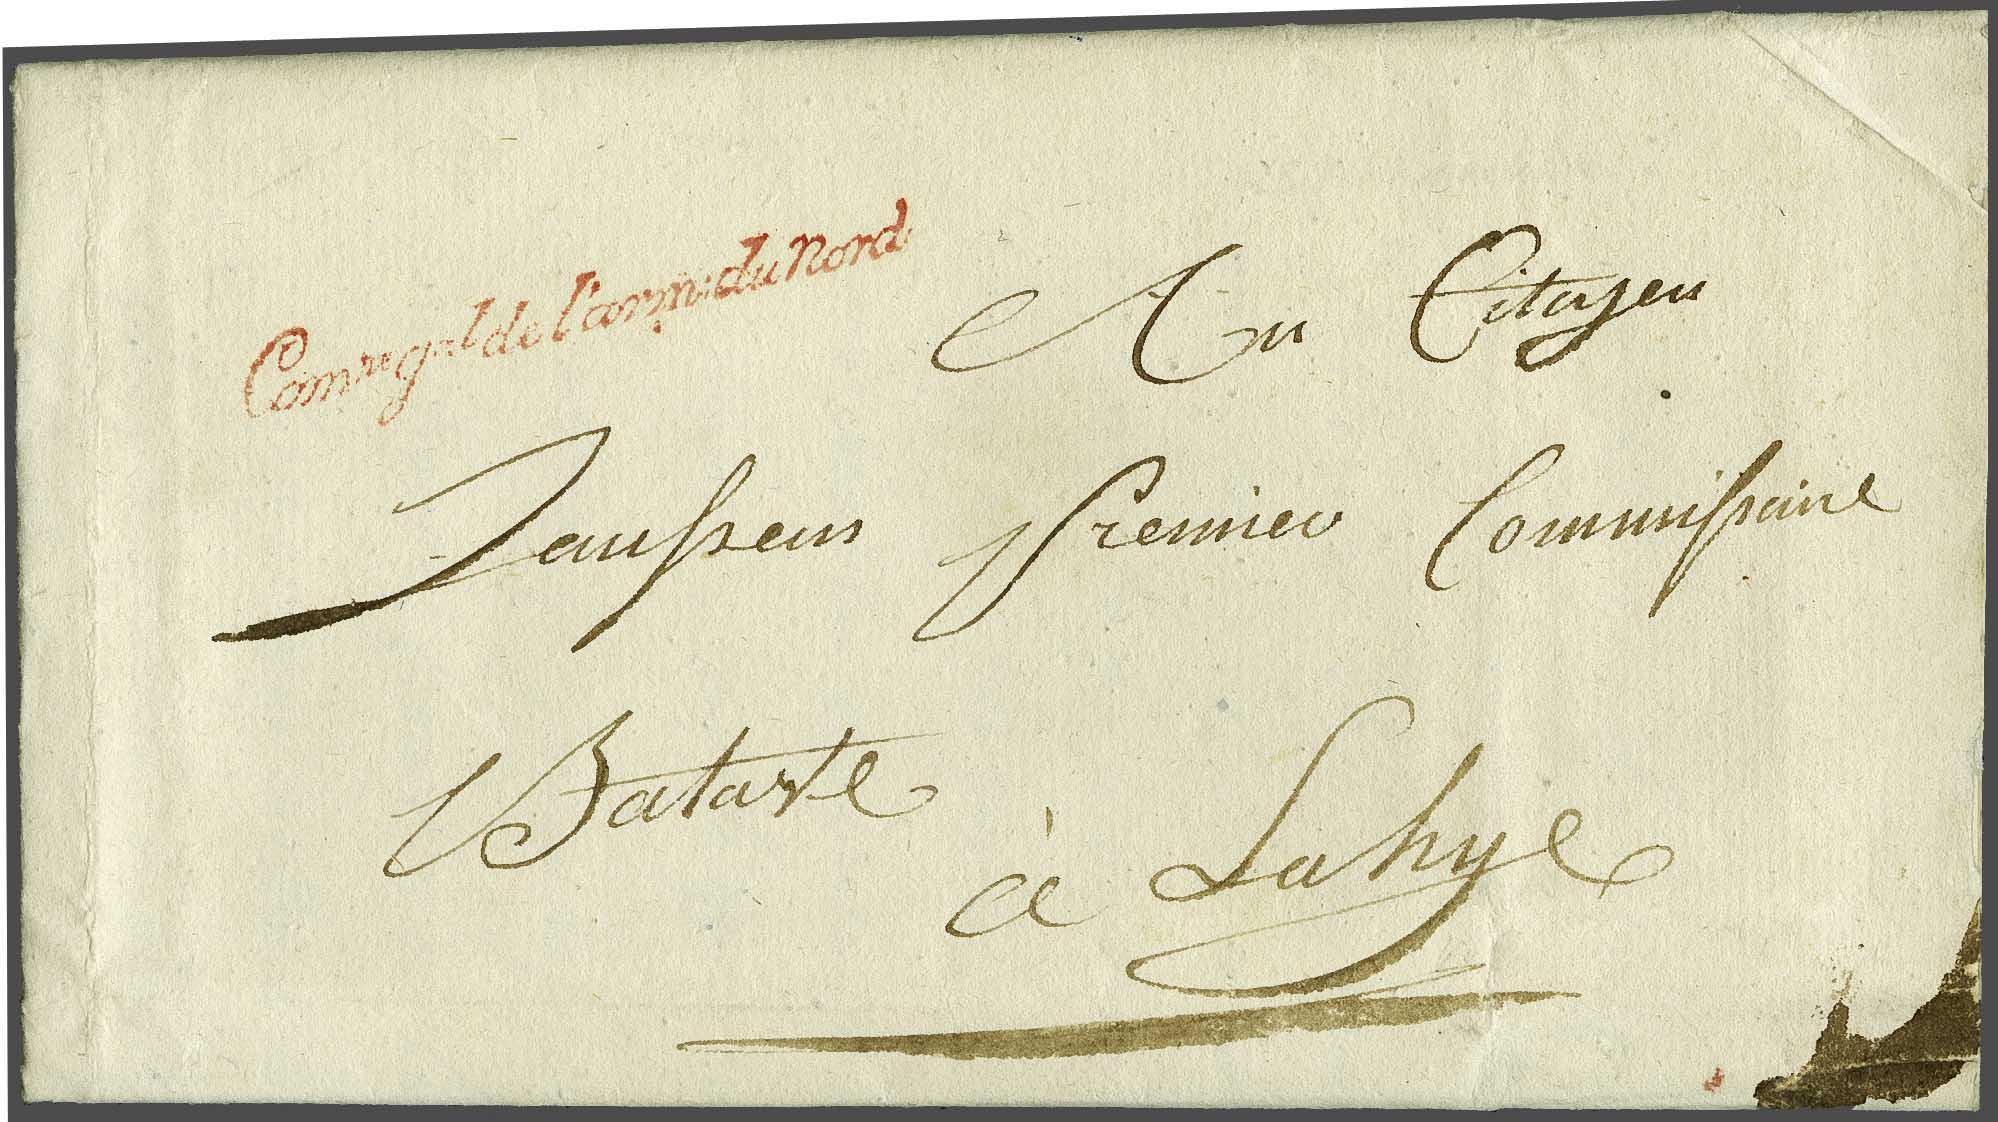 Lot 174 - Netherlands and Former Territories Netherlands -  Corinphila veilingen Auction 233: General sale